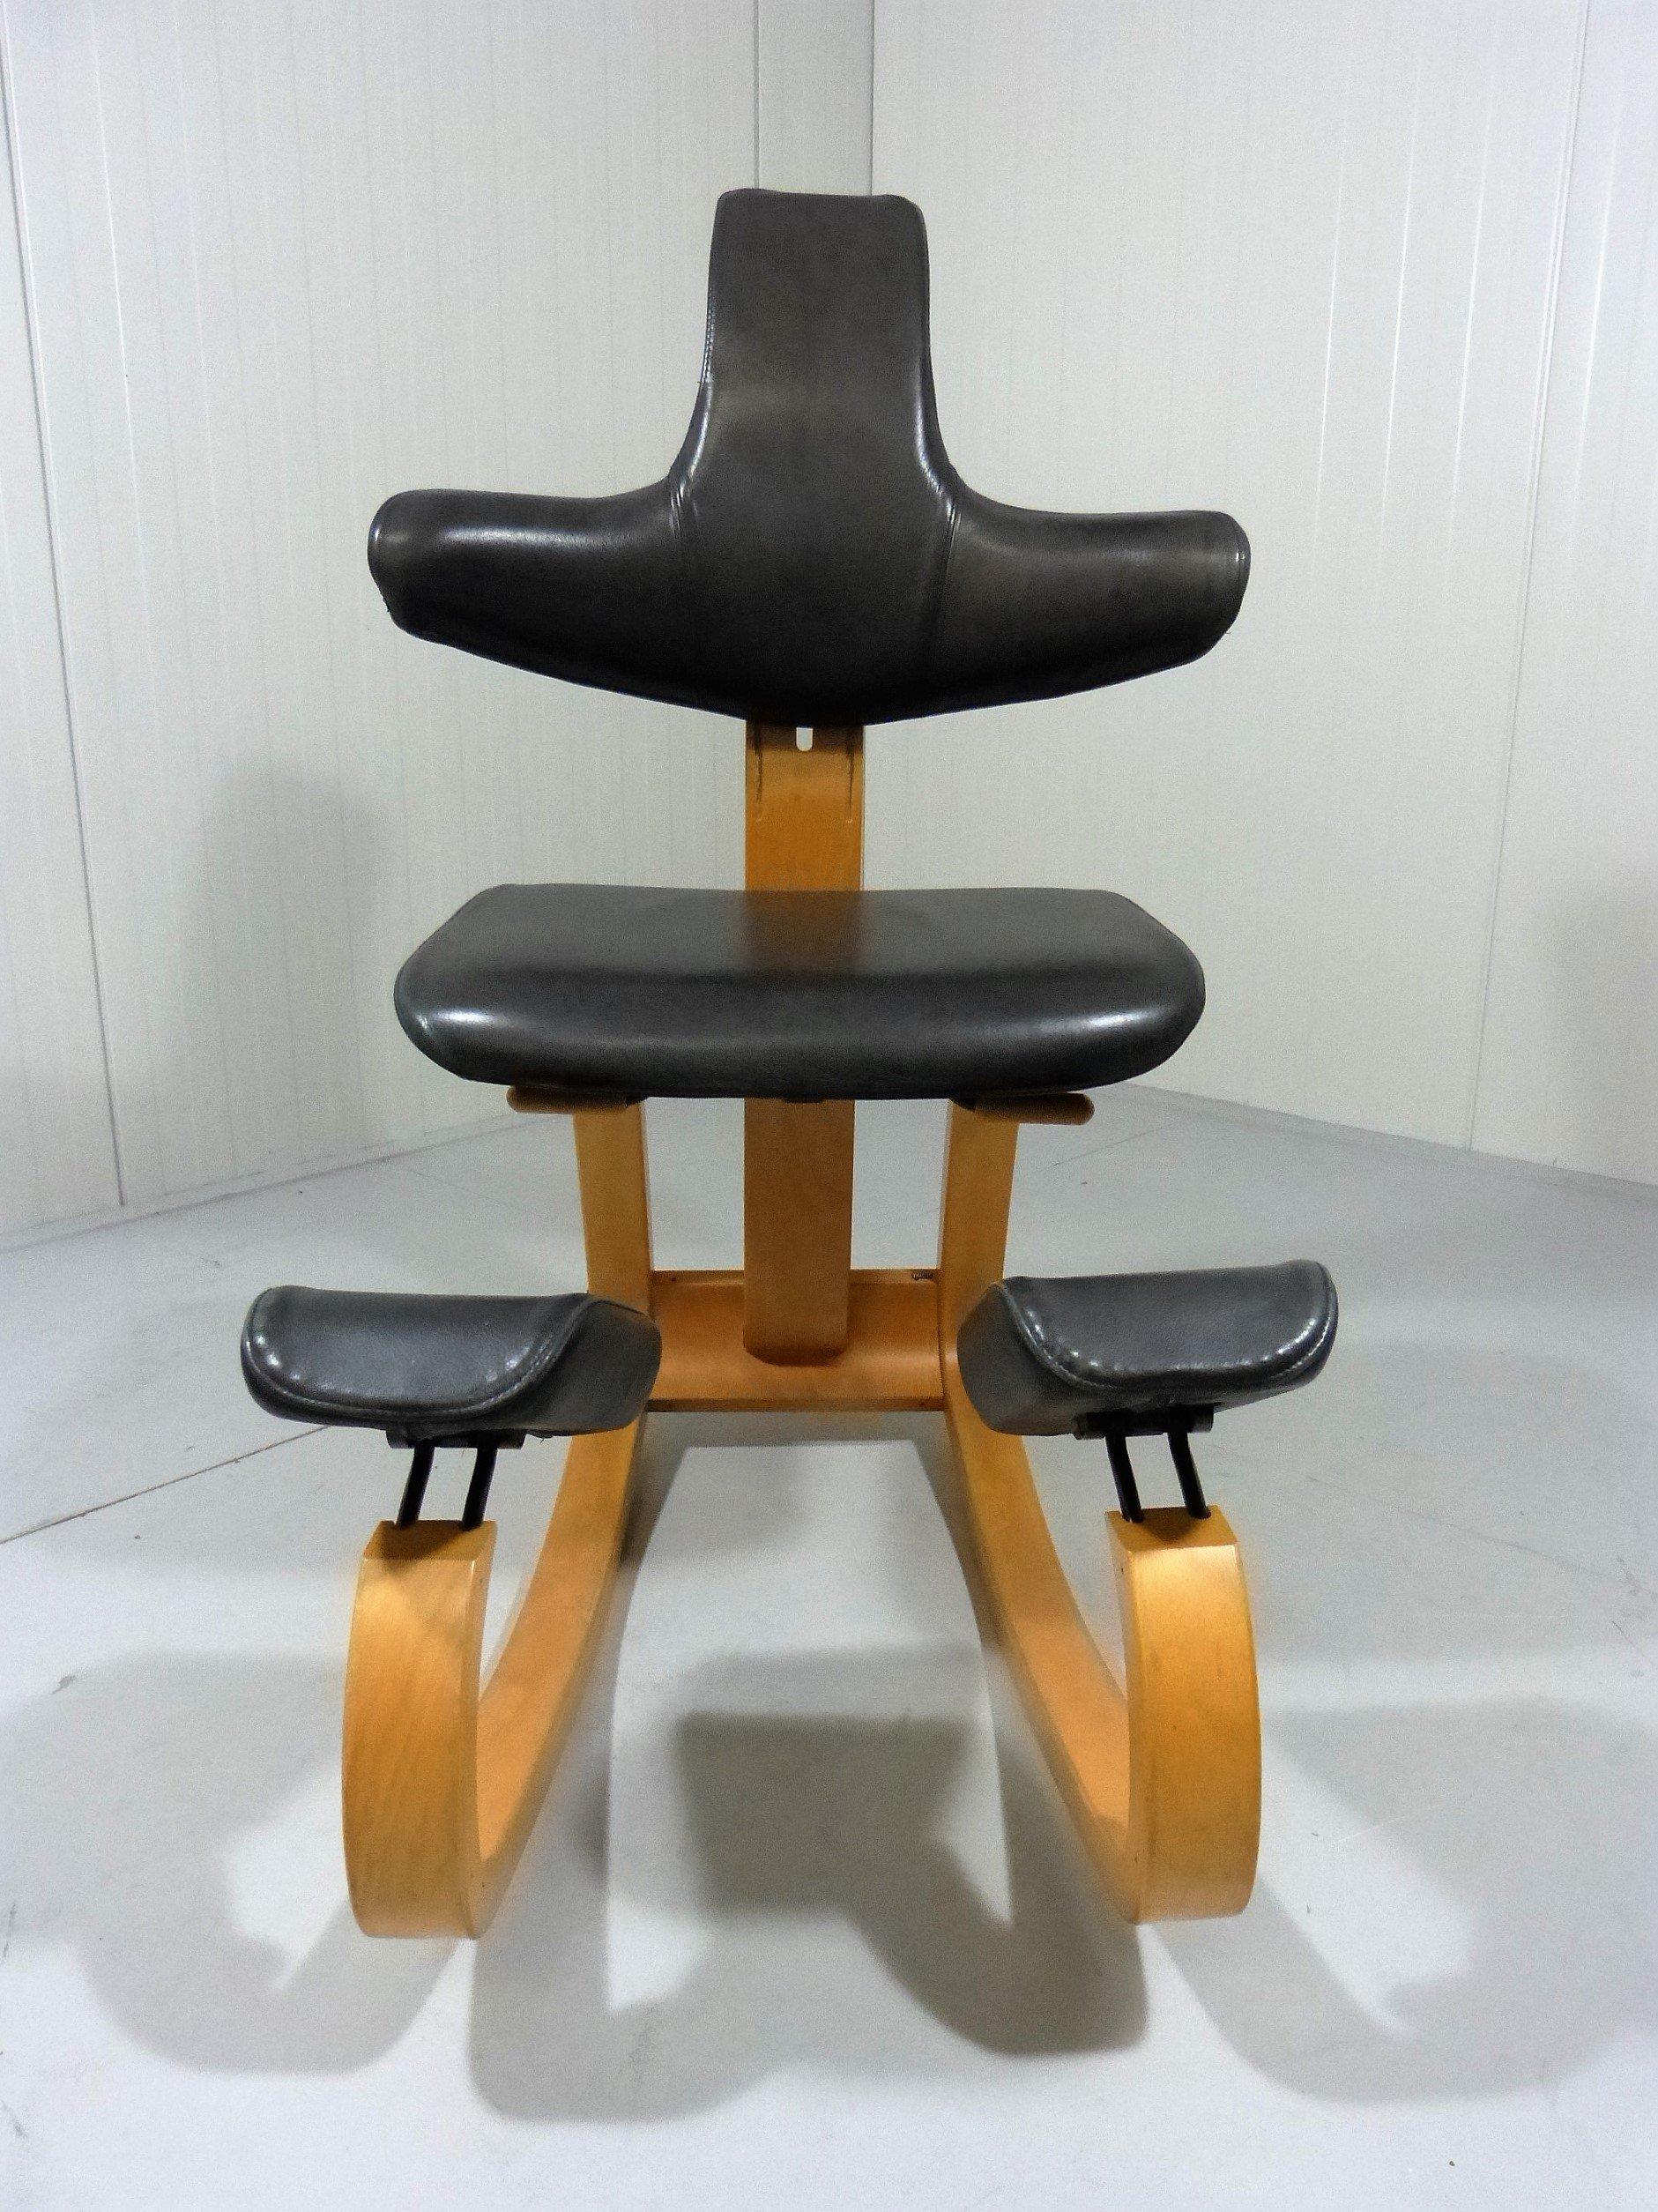 Thatsit beech and leather balance chair Peter OPSVIK 1980s